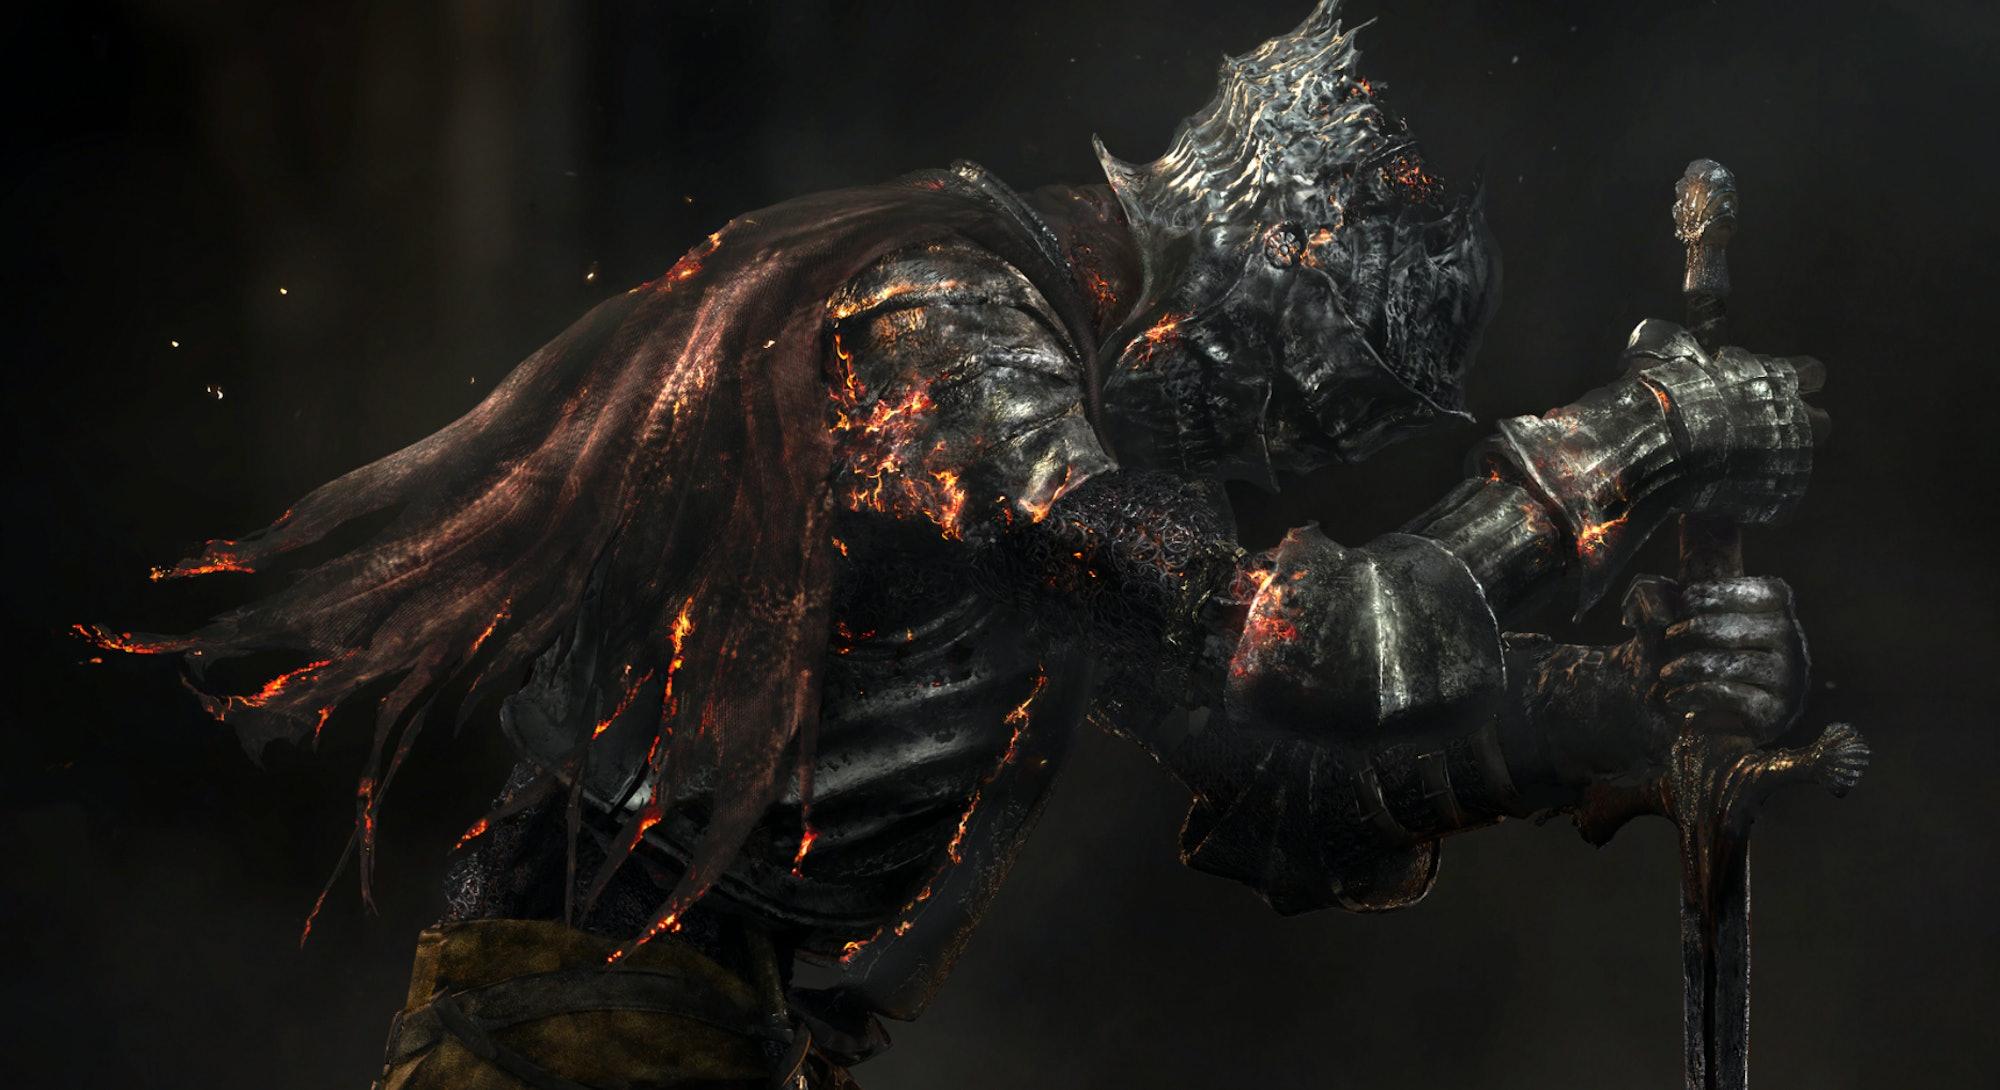 Protagonist from Dark Souls